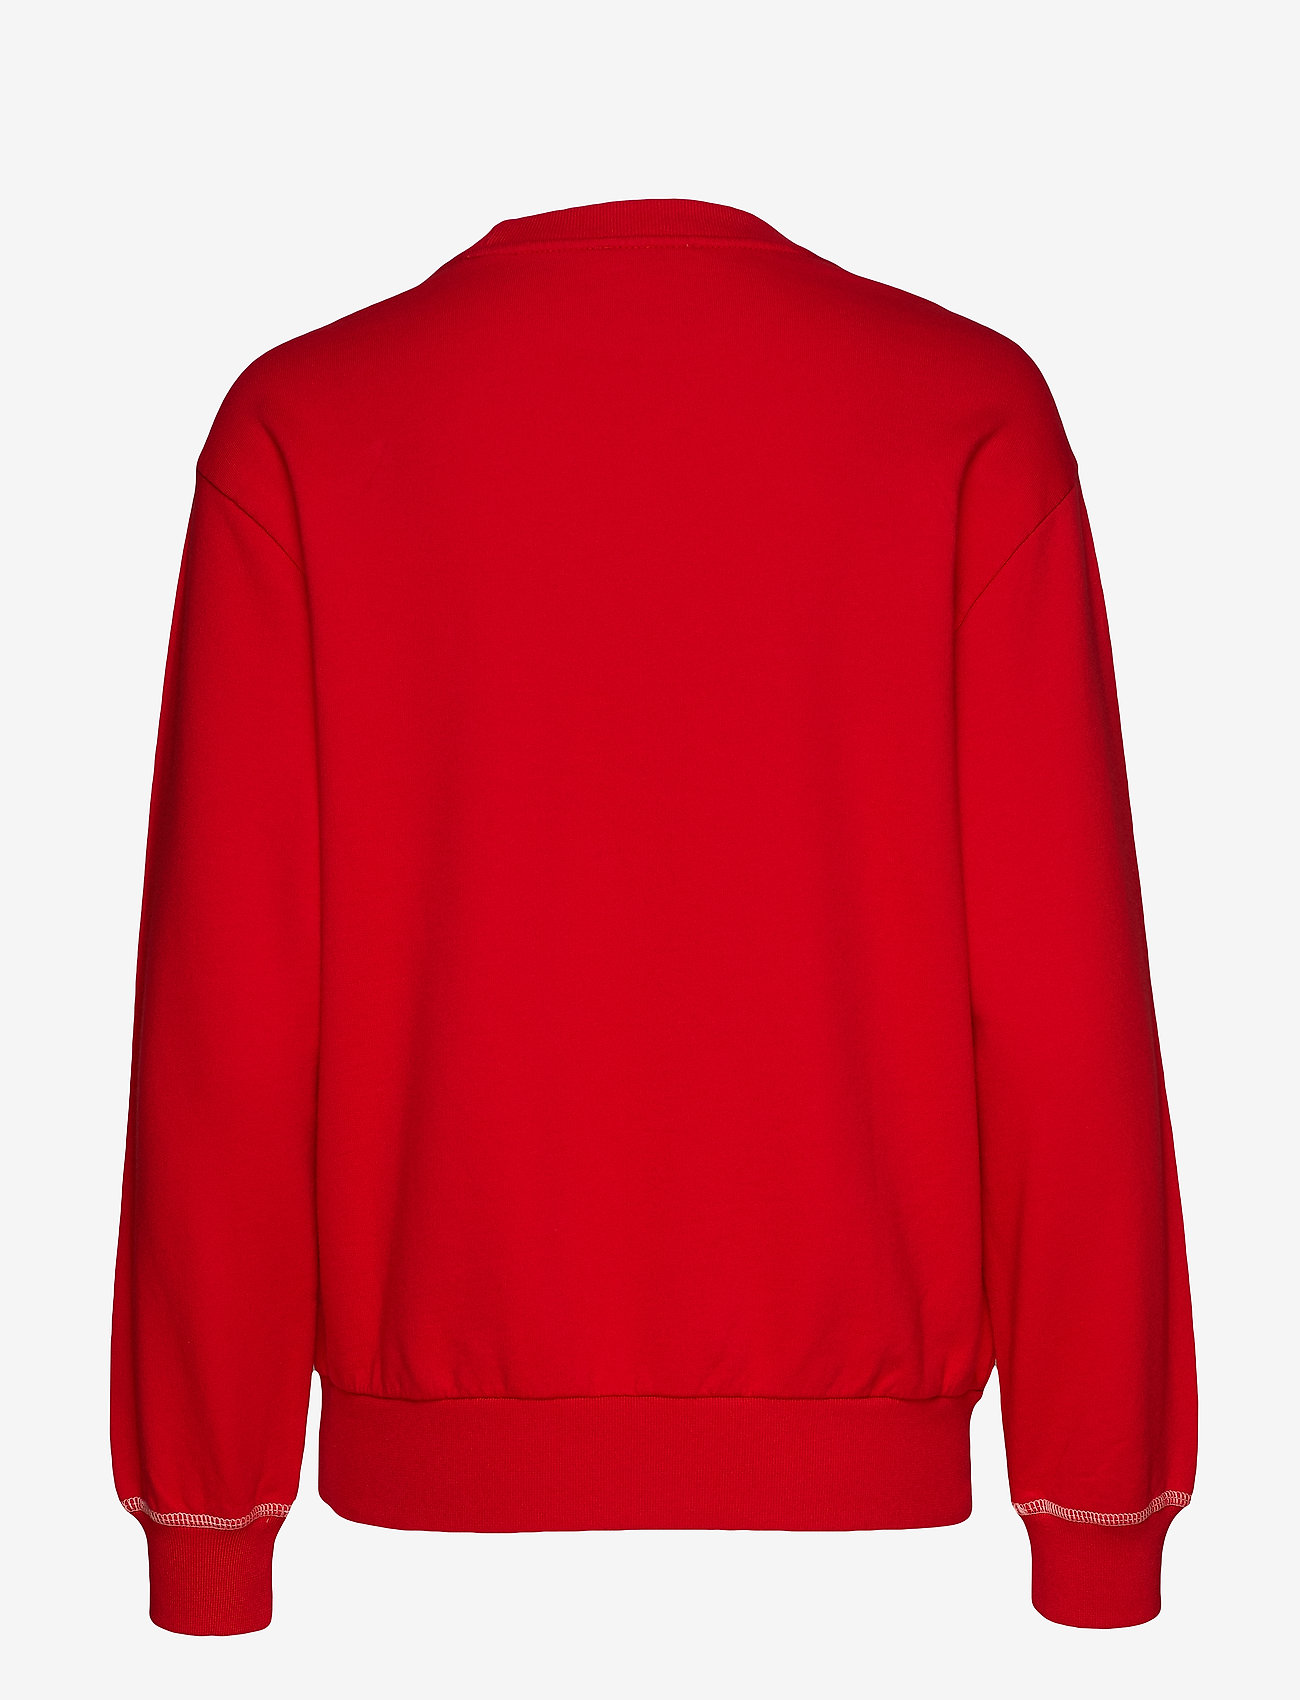 Lee Jeans - LOGO SWS - sweatshirts - warp red - 1